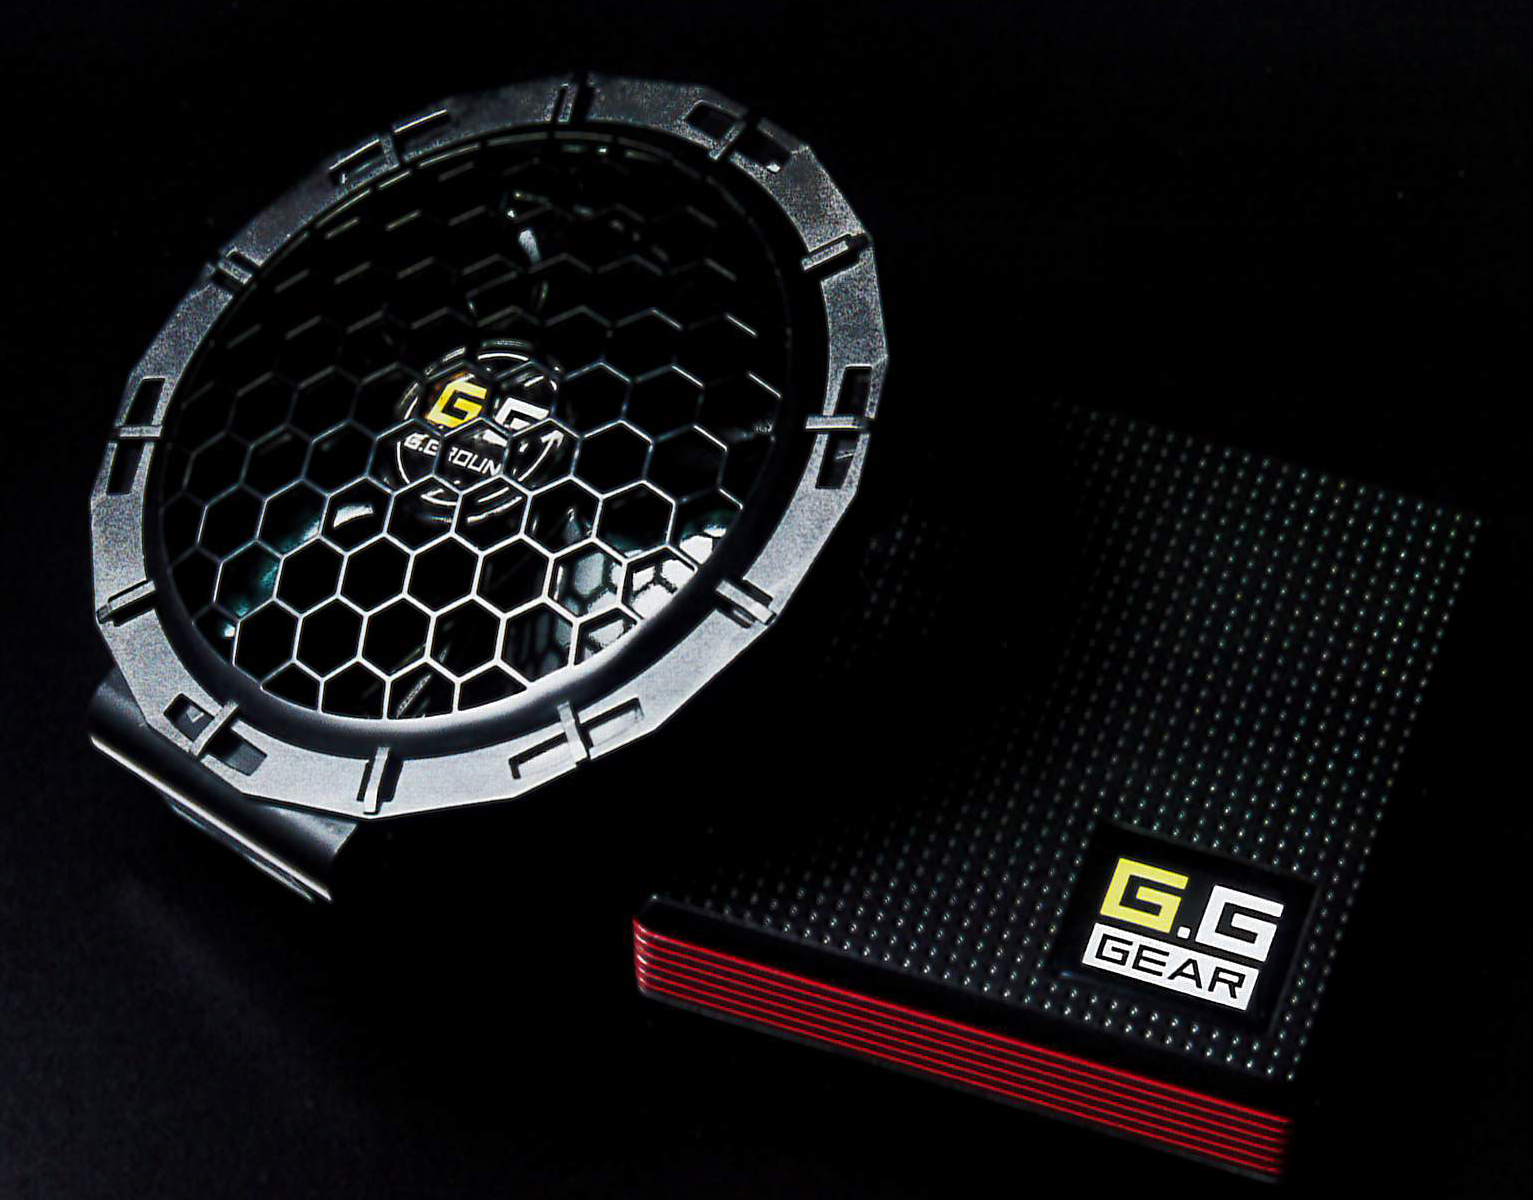 G.GROUND~ジーグランド~18001/18002 ファン・バッテリーセット ¥16,840(税込)